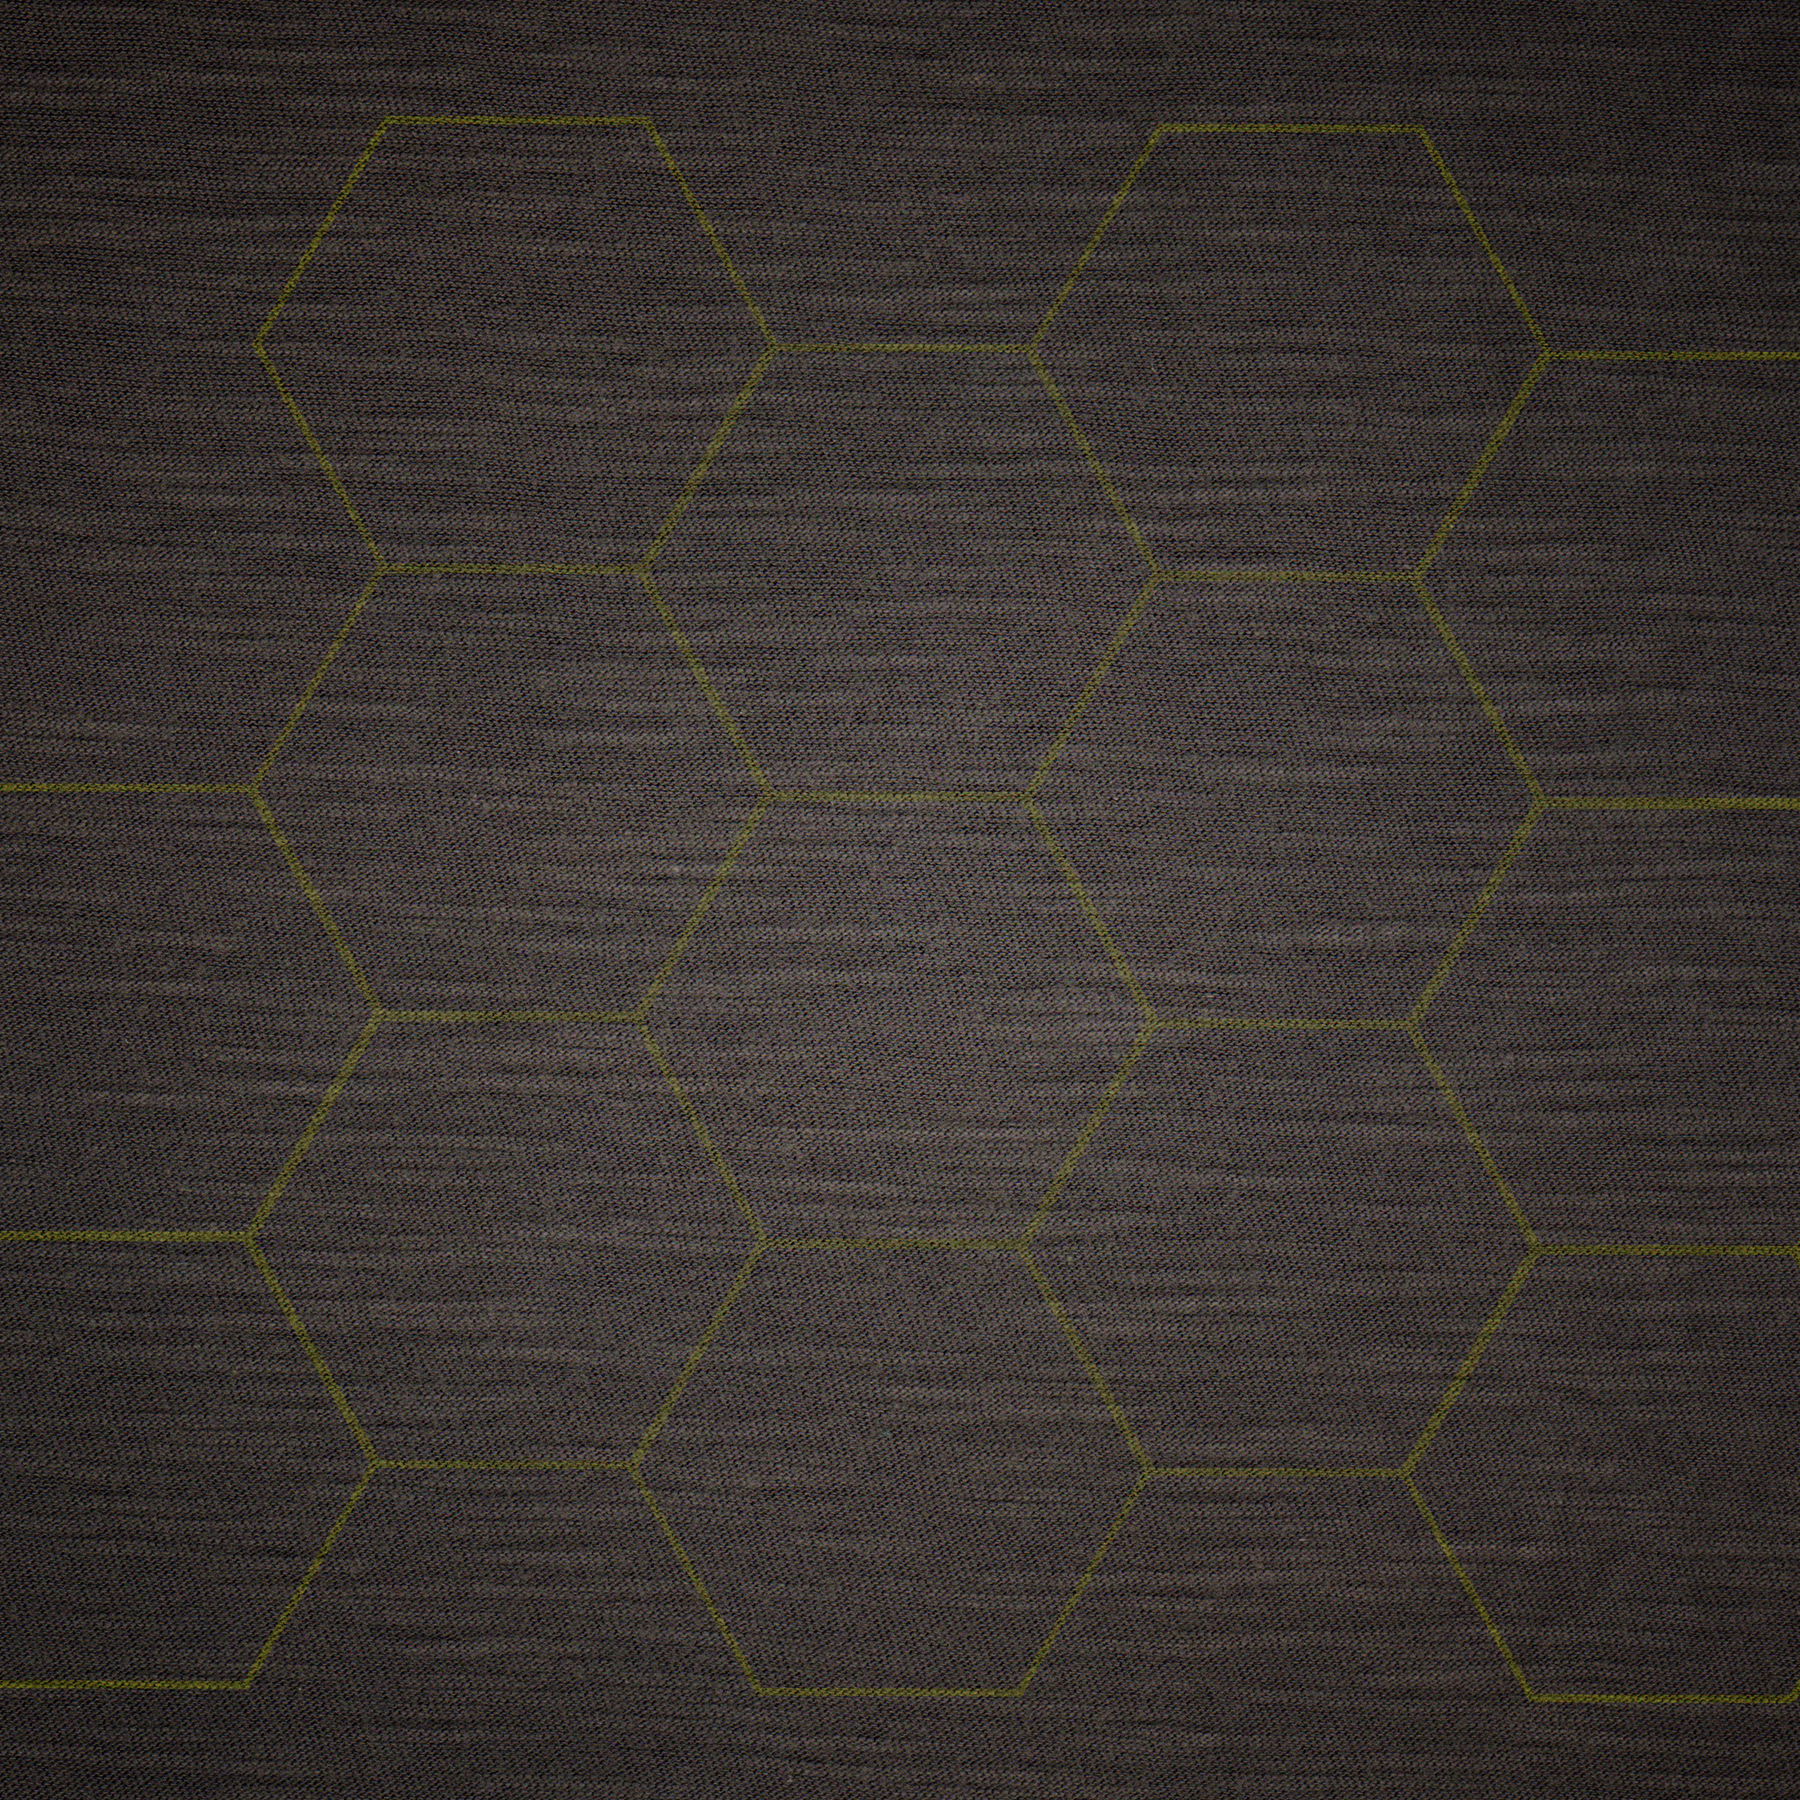 Wallpaper_iPad_Beyond_Ordinary.jpg